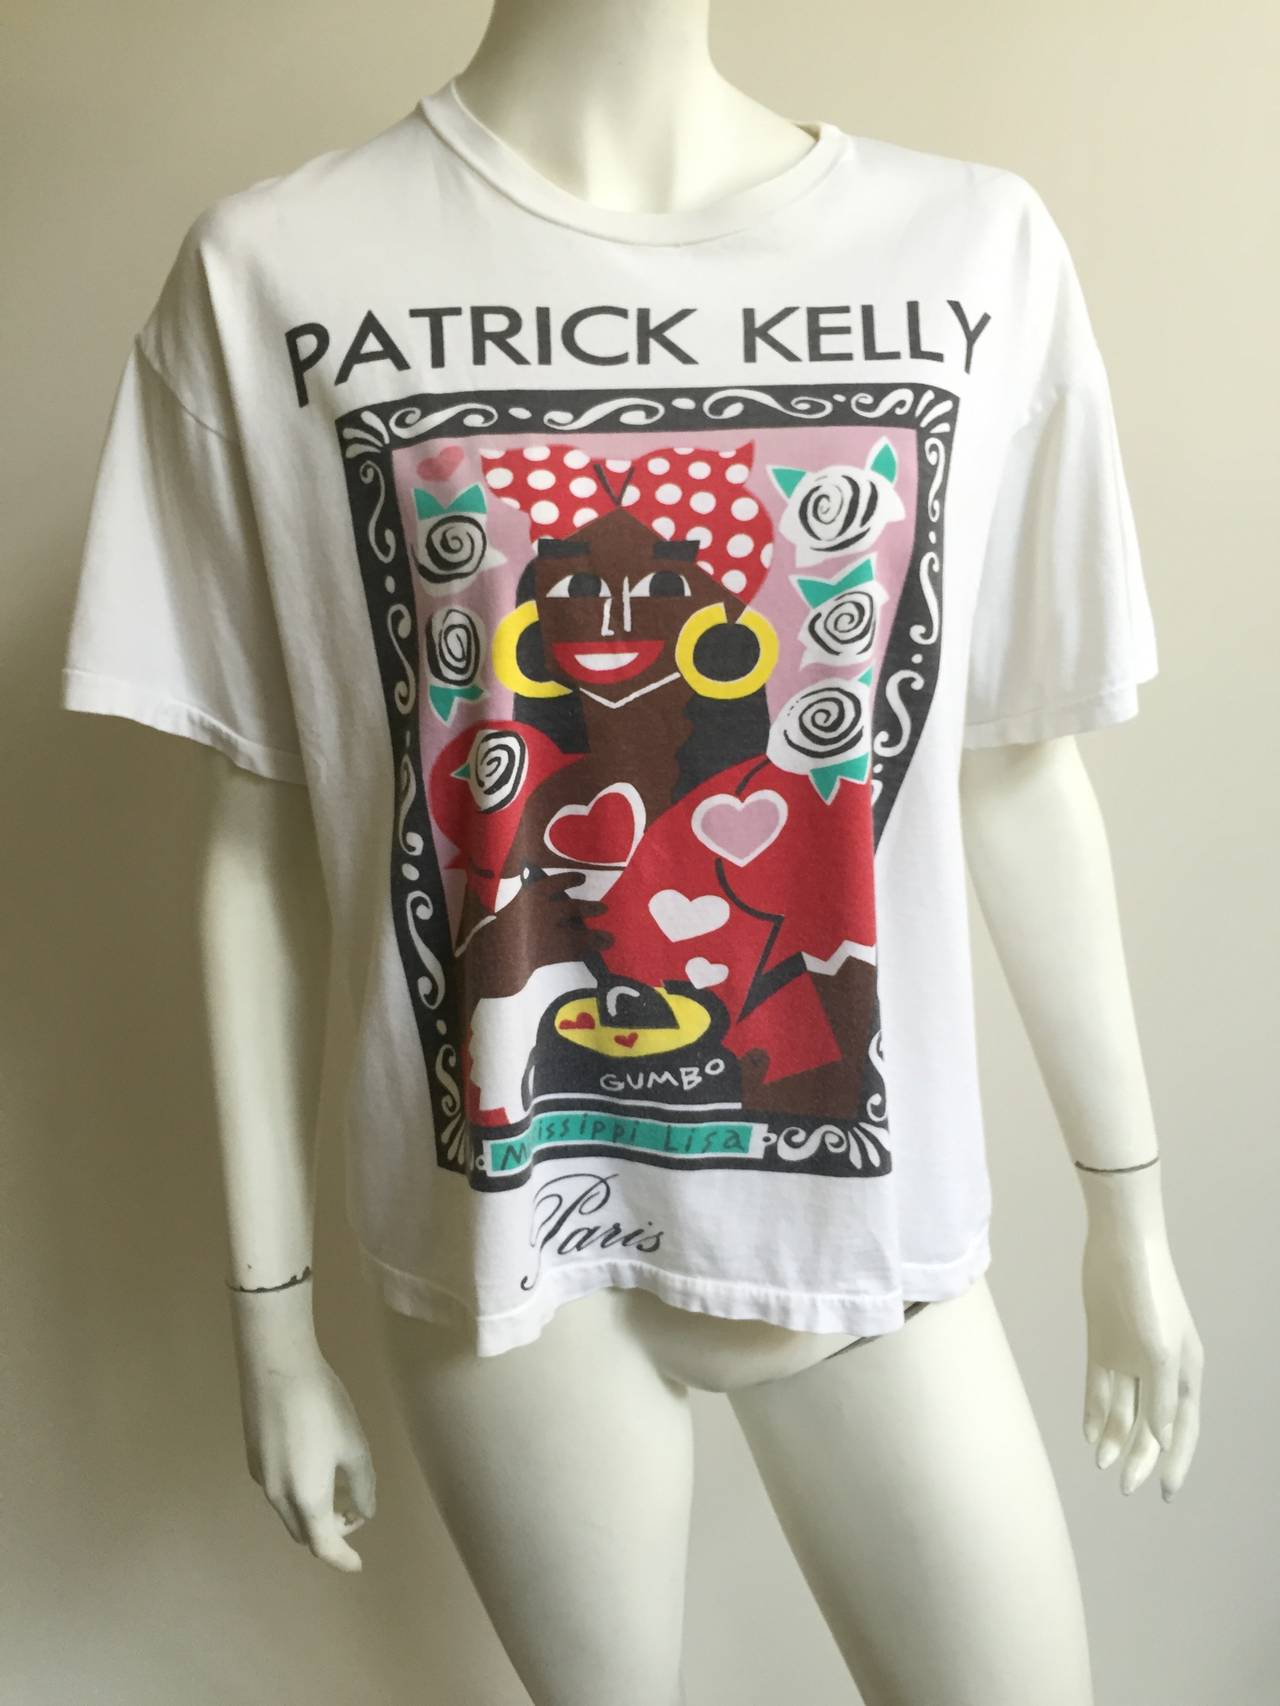 Patrick Kelly 1988 'Mississippi Lisa' t-shirt . 9